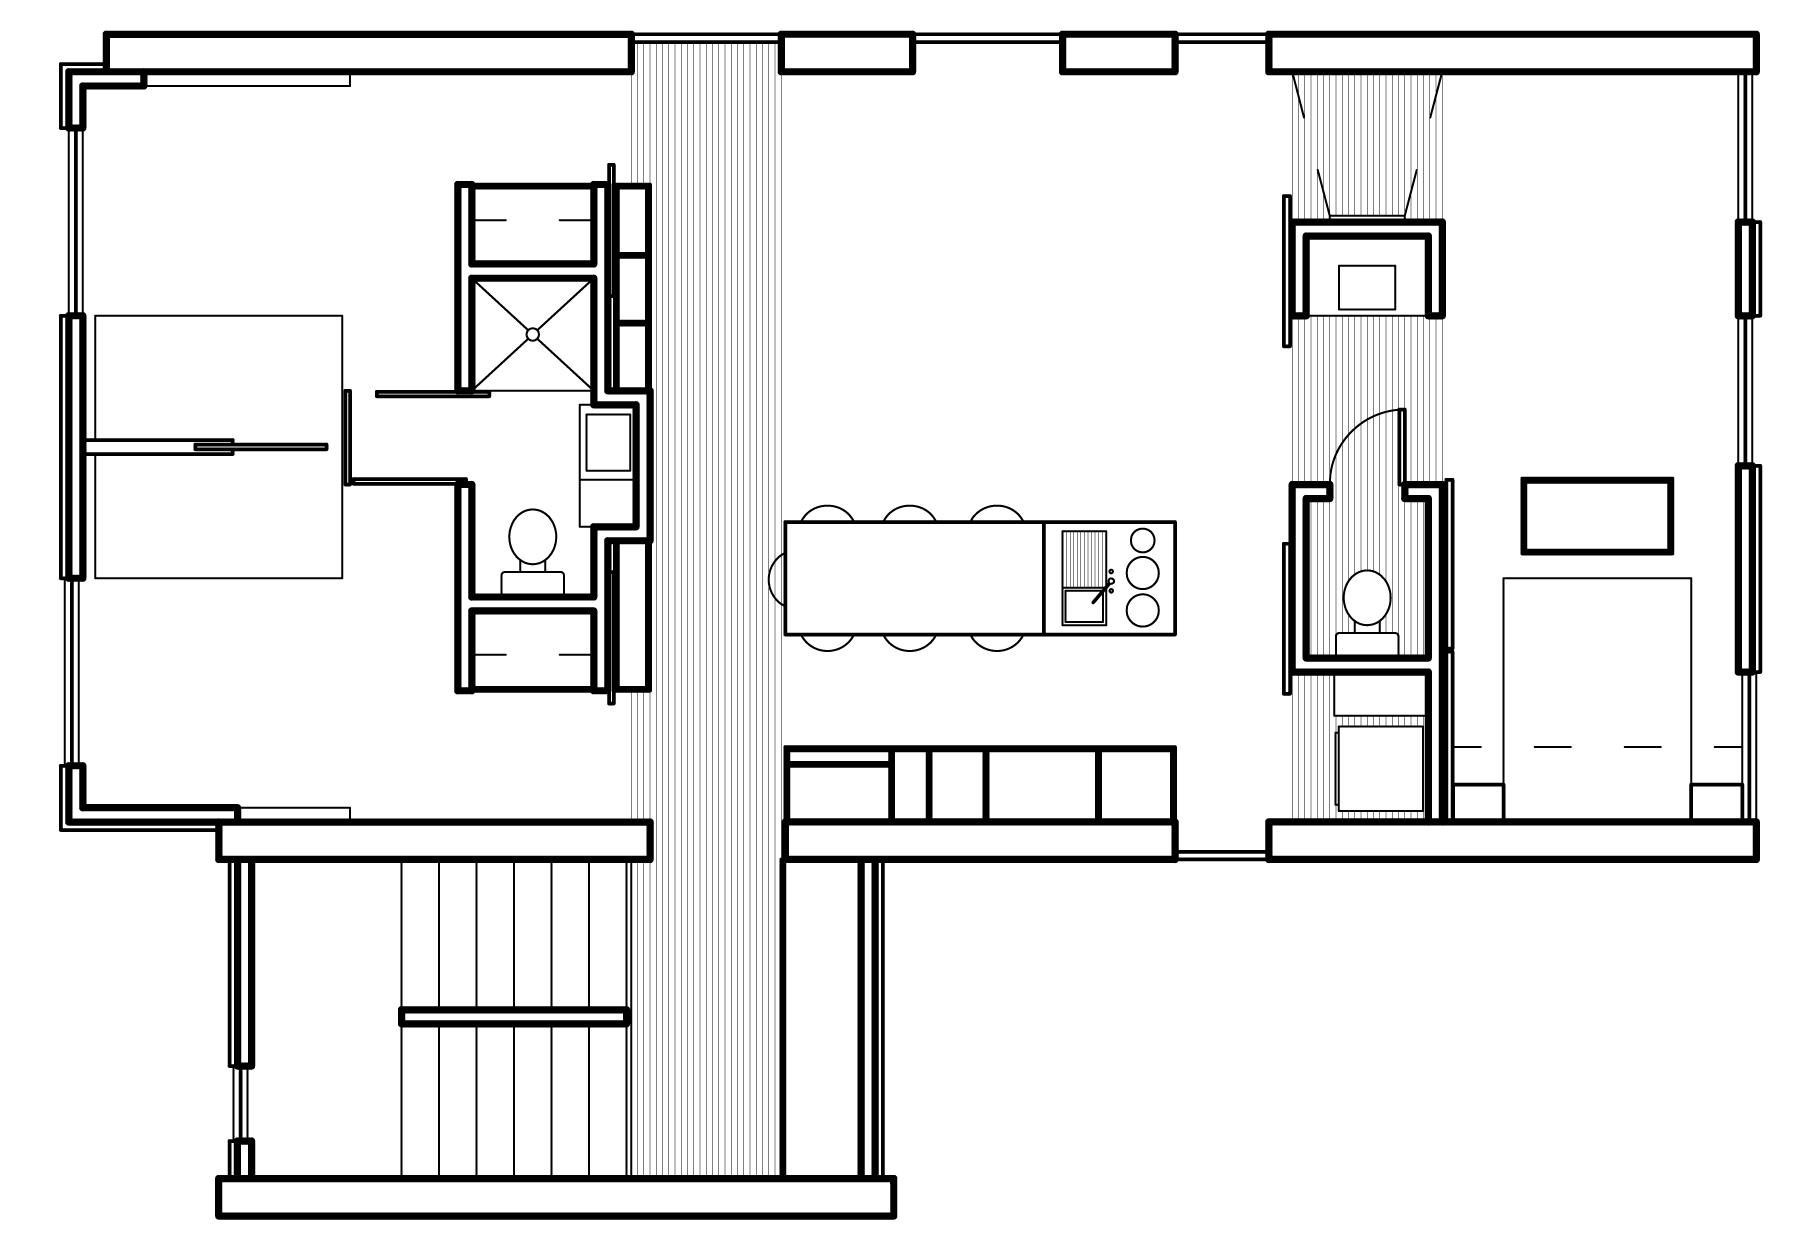 Modern House Plans Contemporary Home Designs Floor Plan 01